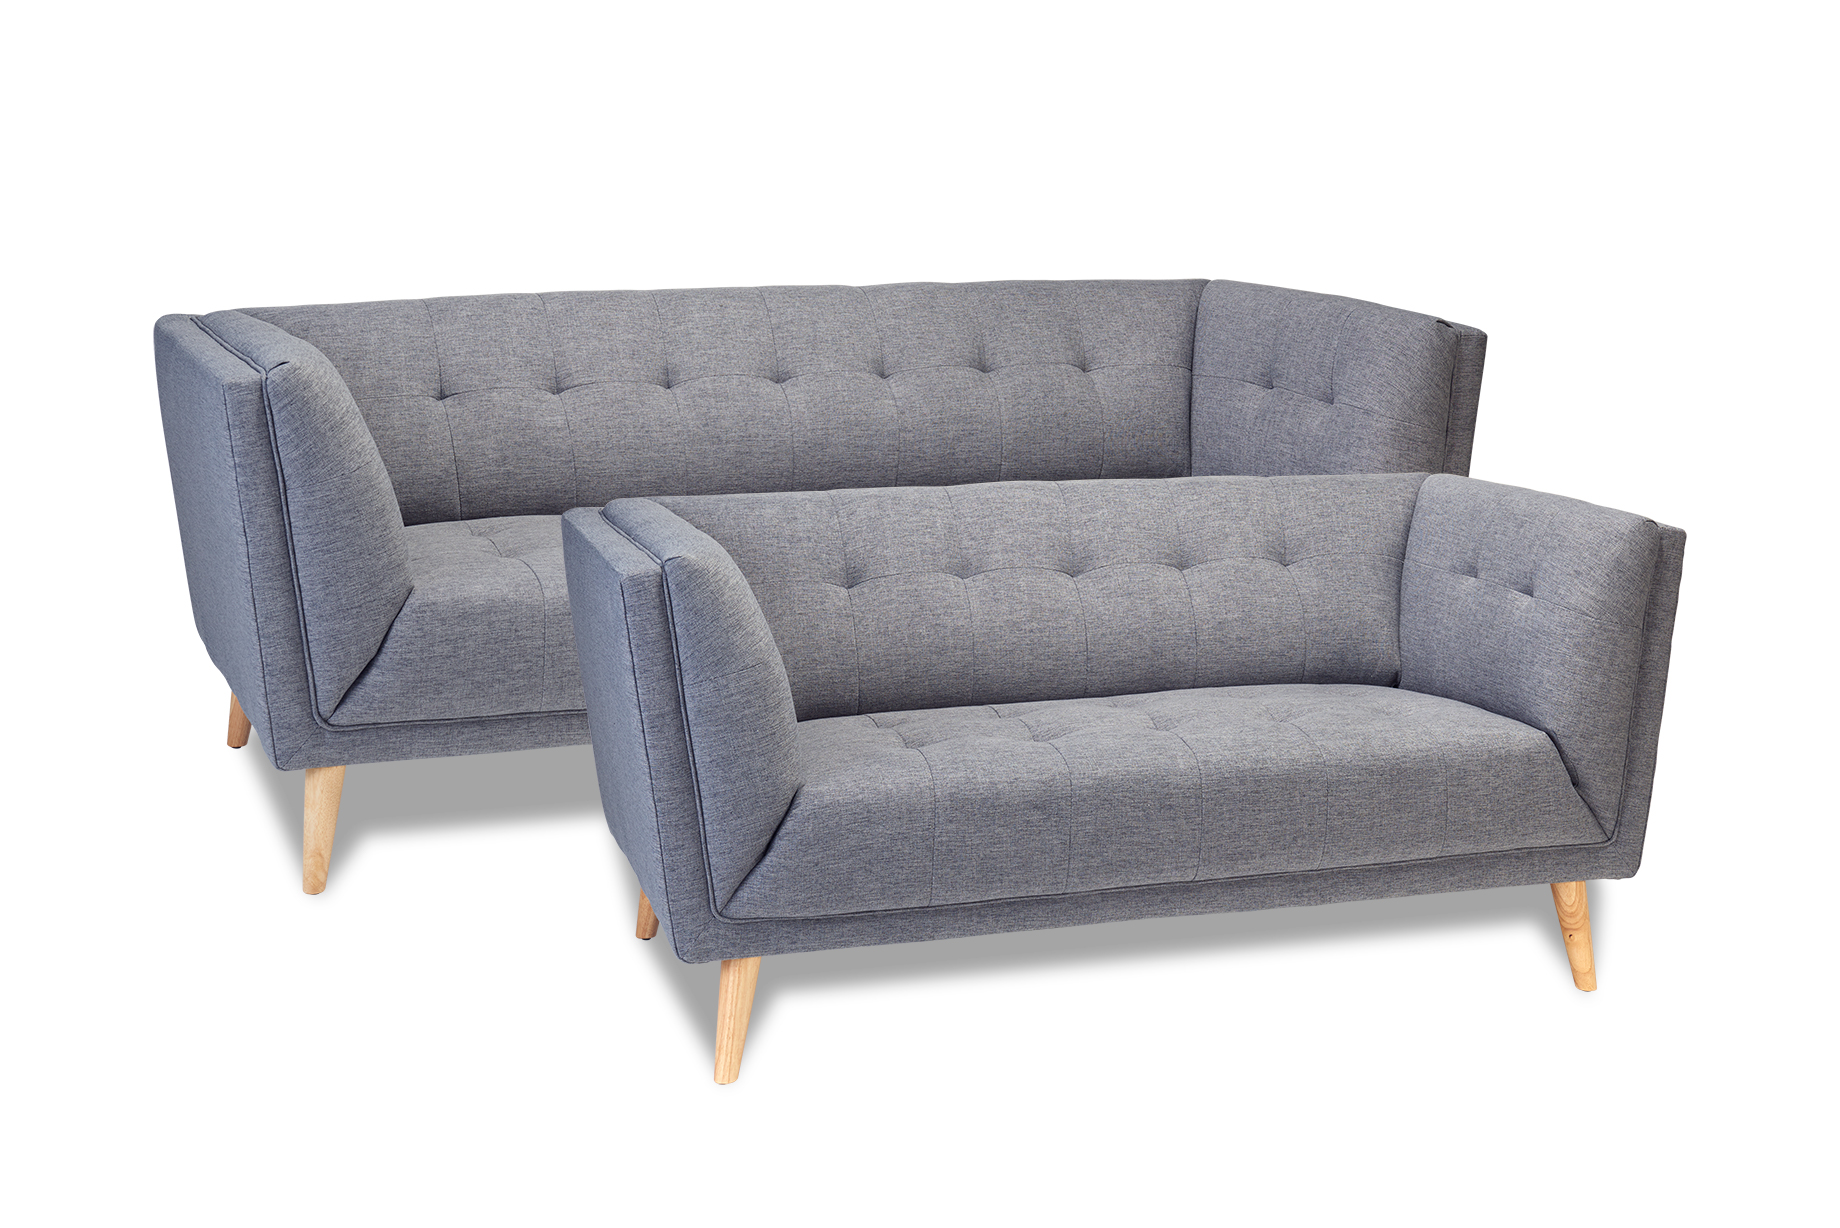 Palermo sofa - grå/naturfarvet stof, 3 personers sofa